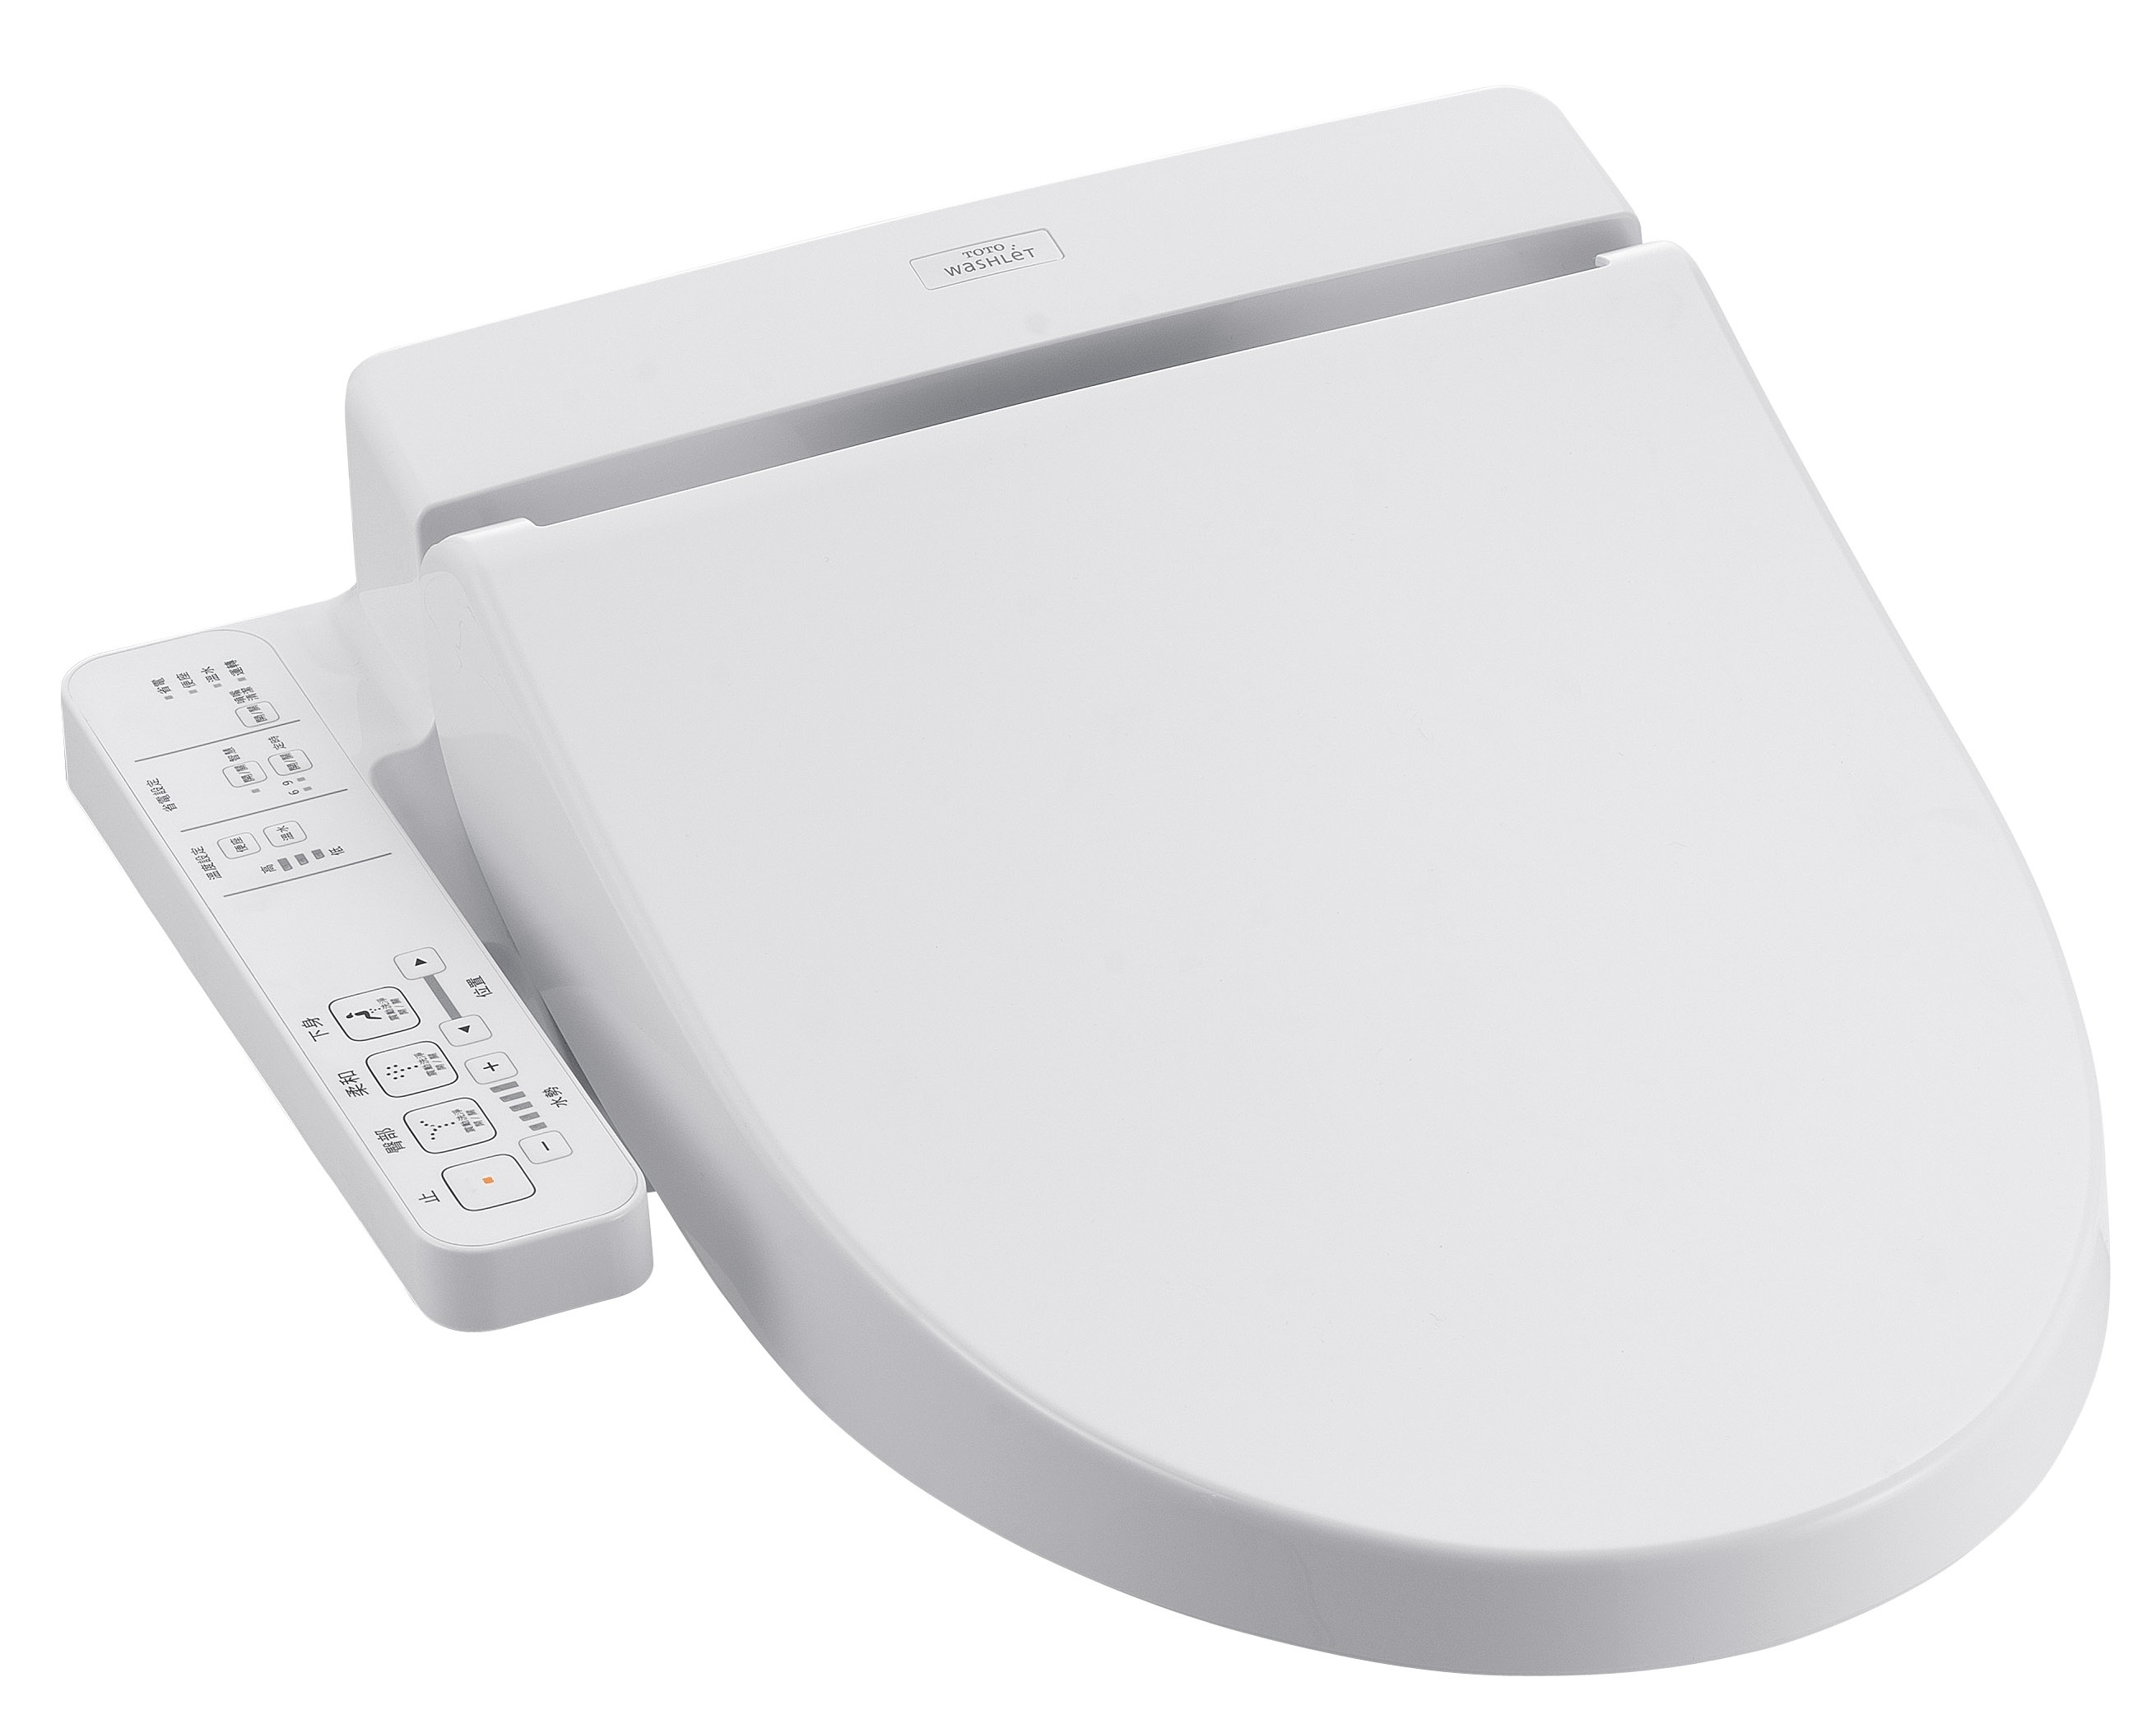 TOTO新一代WASHLET NEW S系列 搭載業界首創「前噴霧技術」 清潔更輕鬆